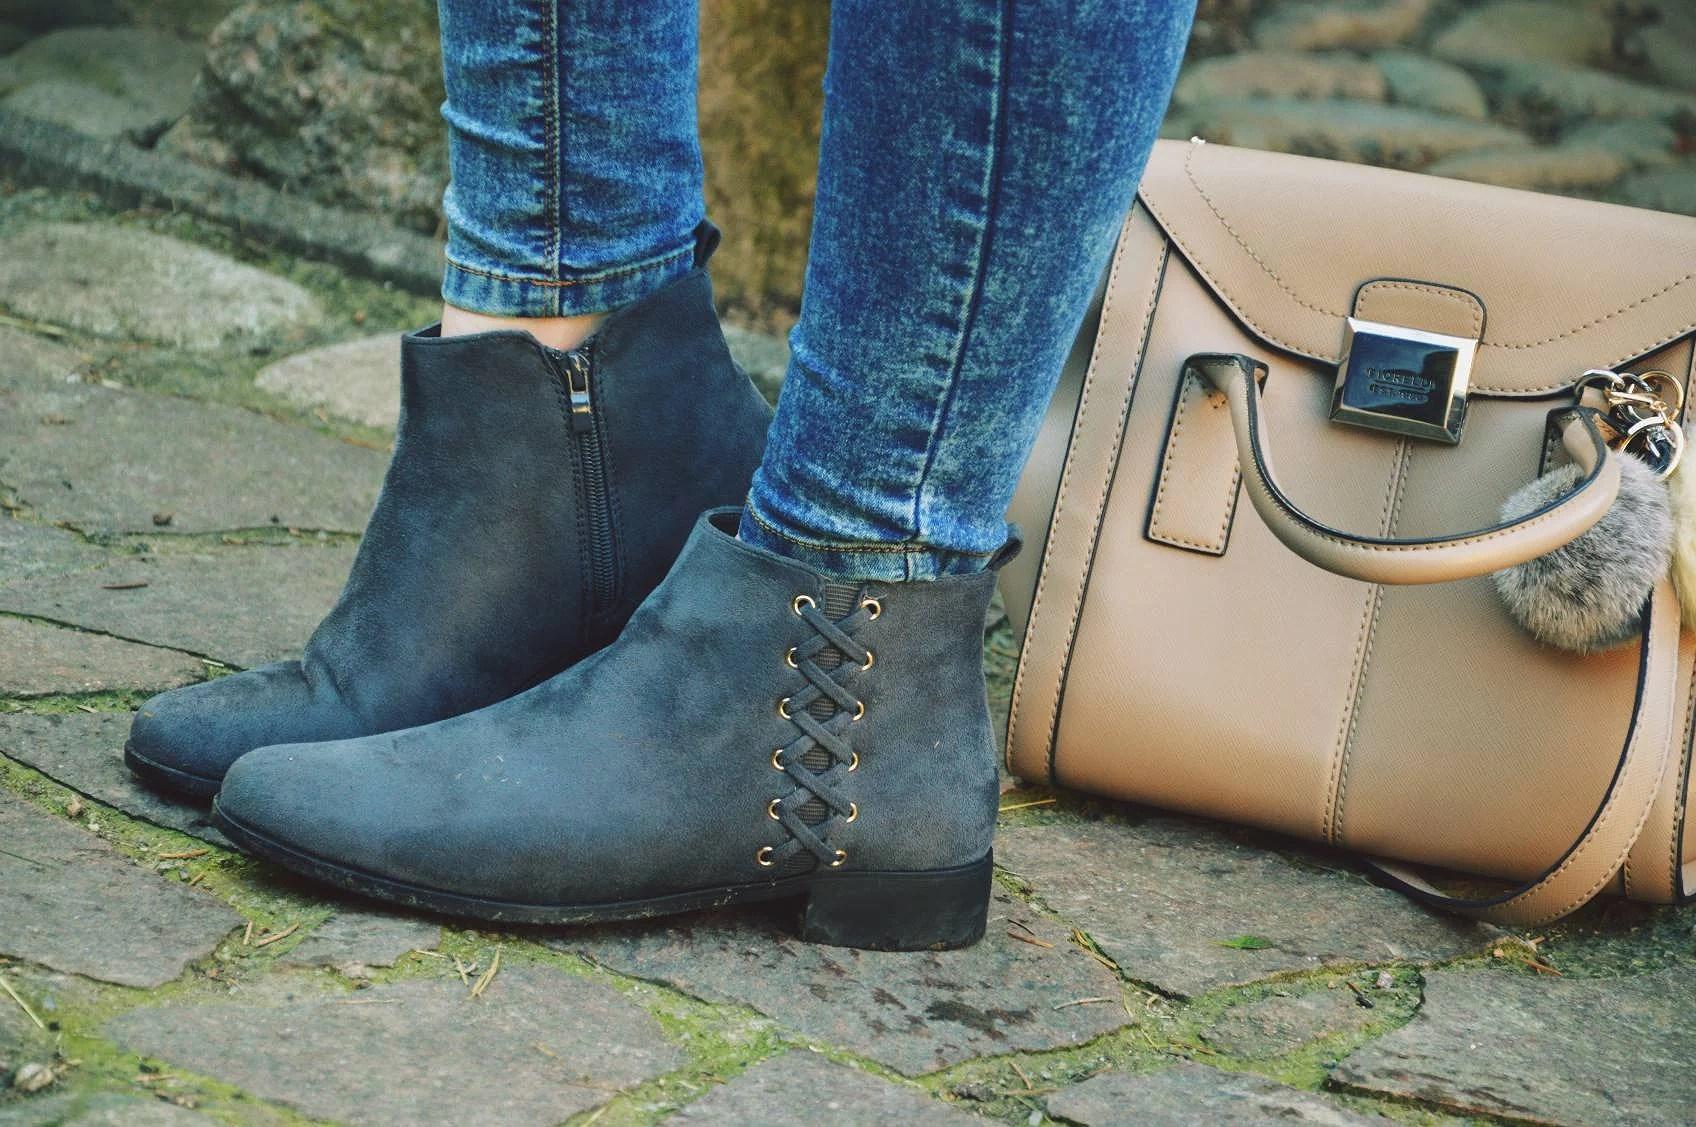 botki, outfit, merg, jeans, bag